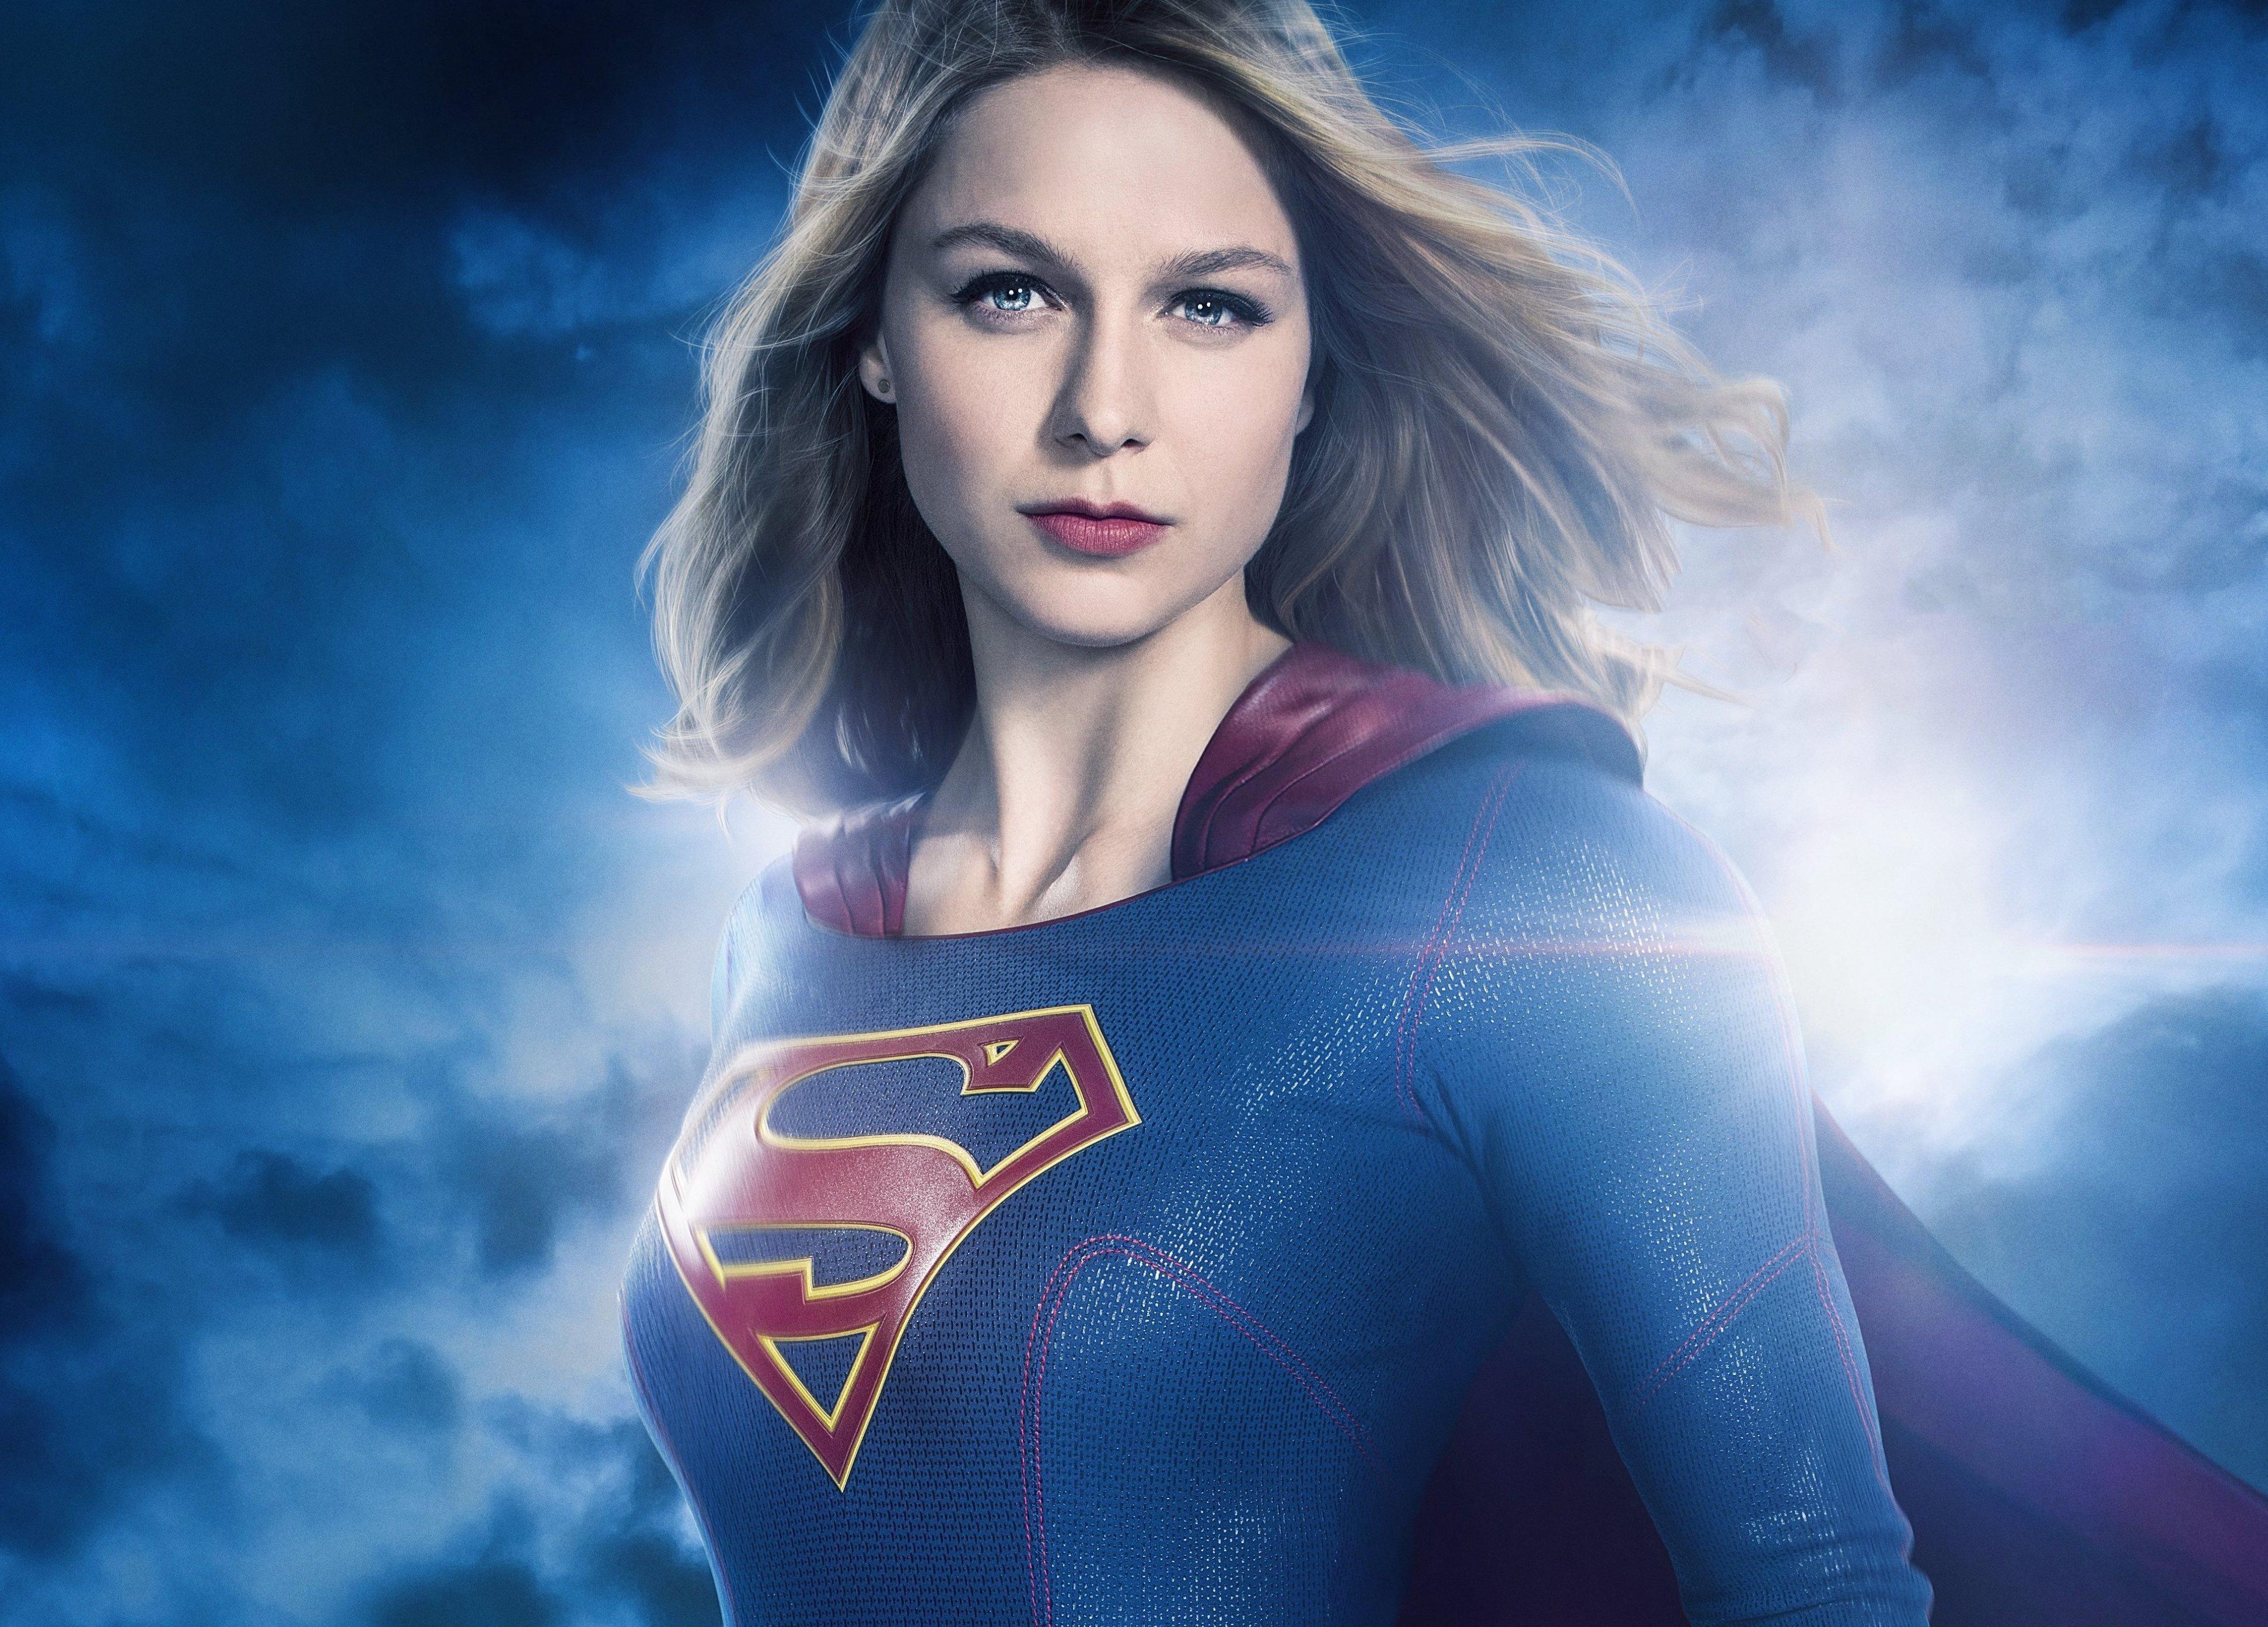 Melissa Gorga 4k Wallpapers: Supergirl Season 3 4k, HD Tv Shows, 4k Wallpapers, Images